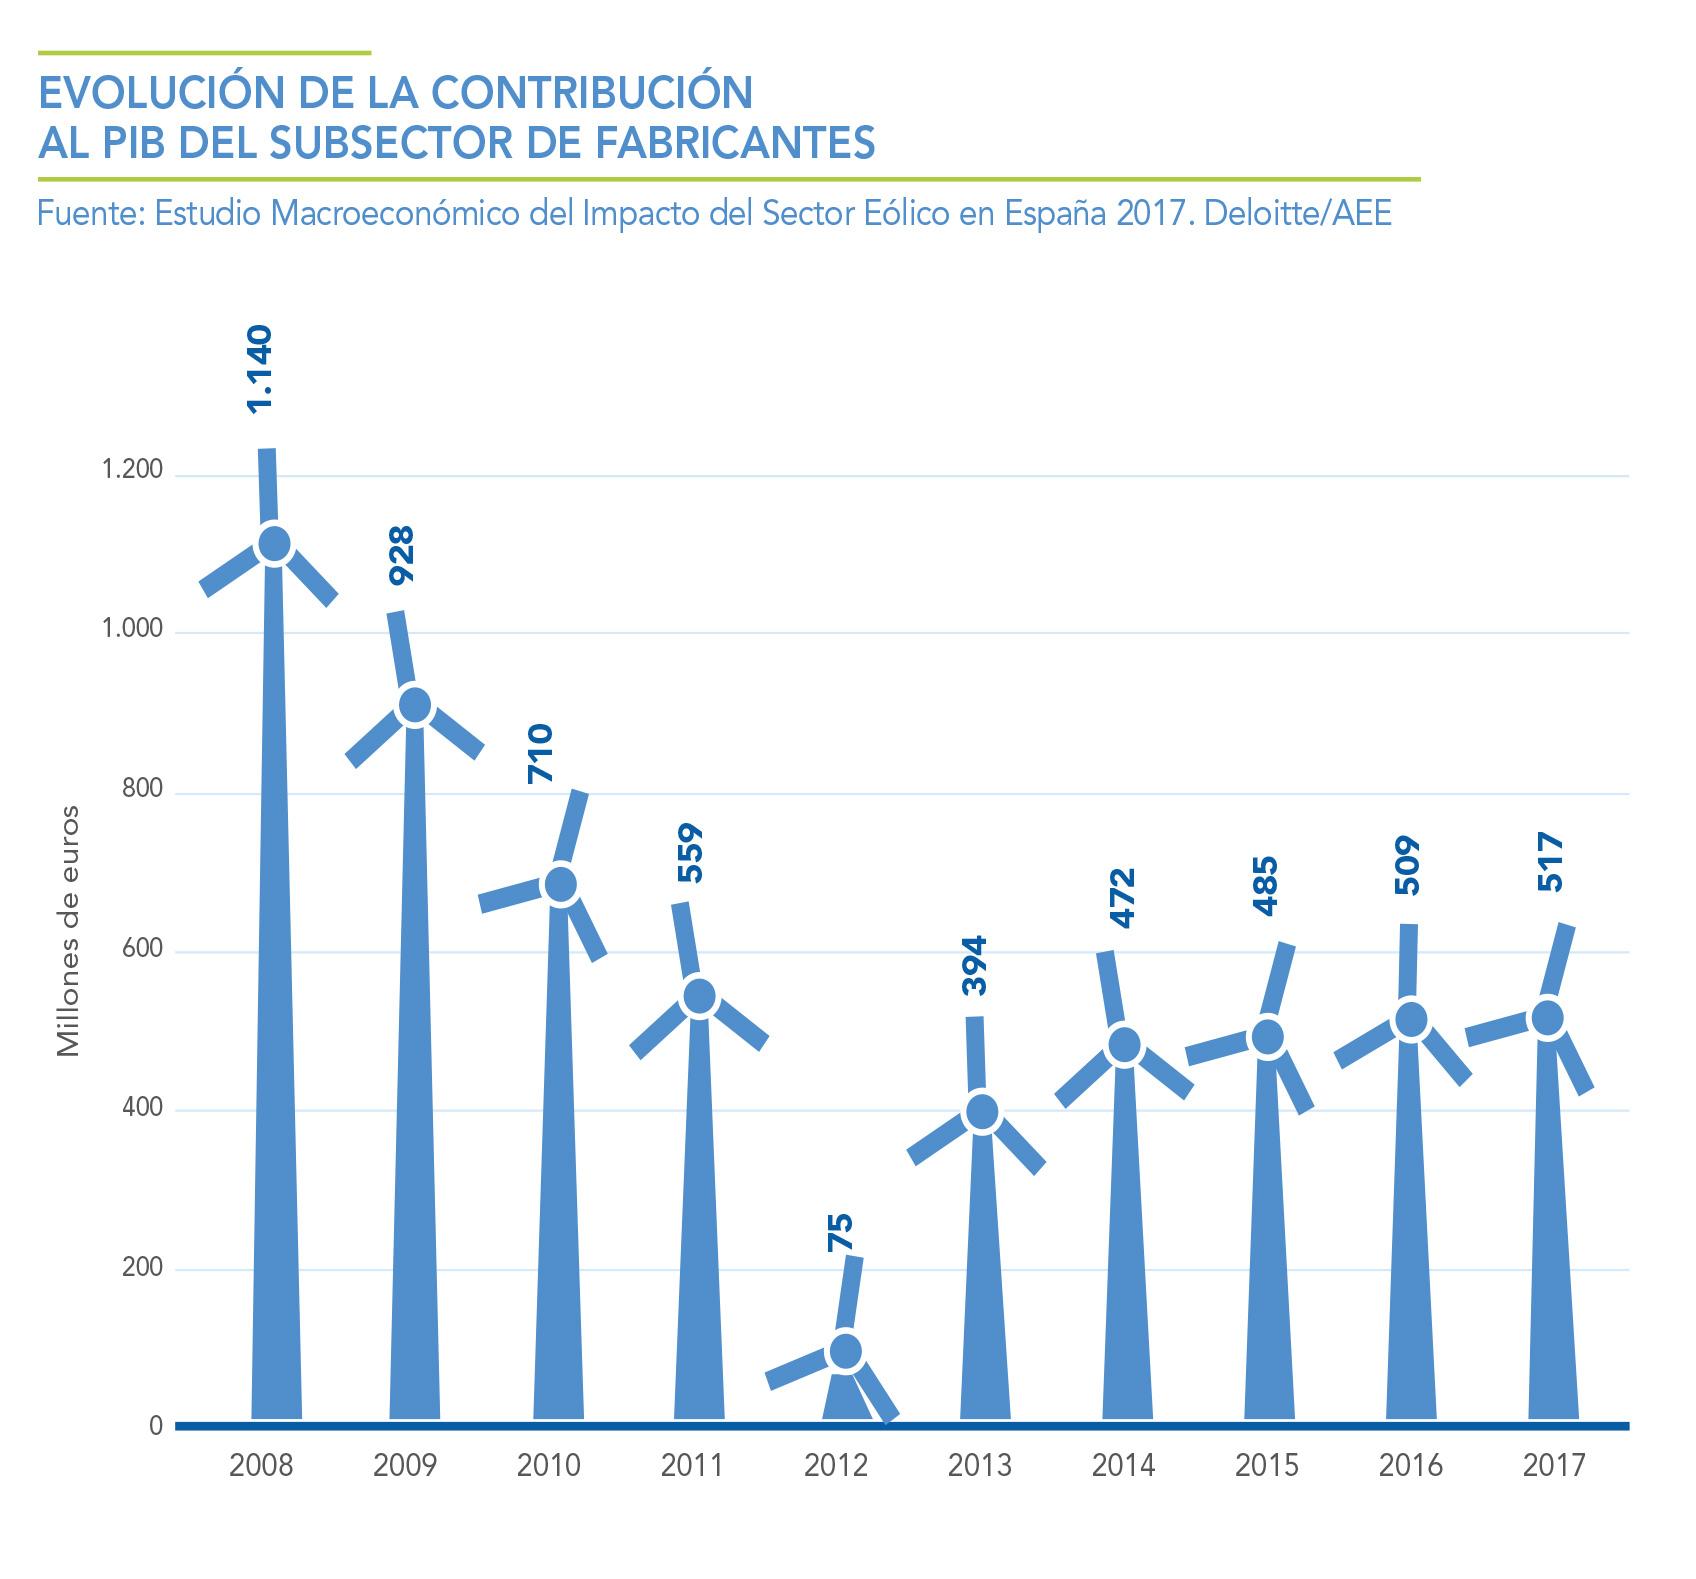 EVOLUCION-DE-LA-CONTRIBUCION-AL-PIB-DEL-SUBSECTOR-DE-FABRICANTES